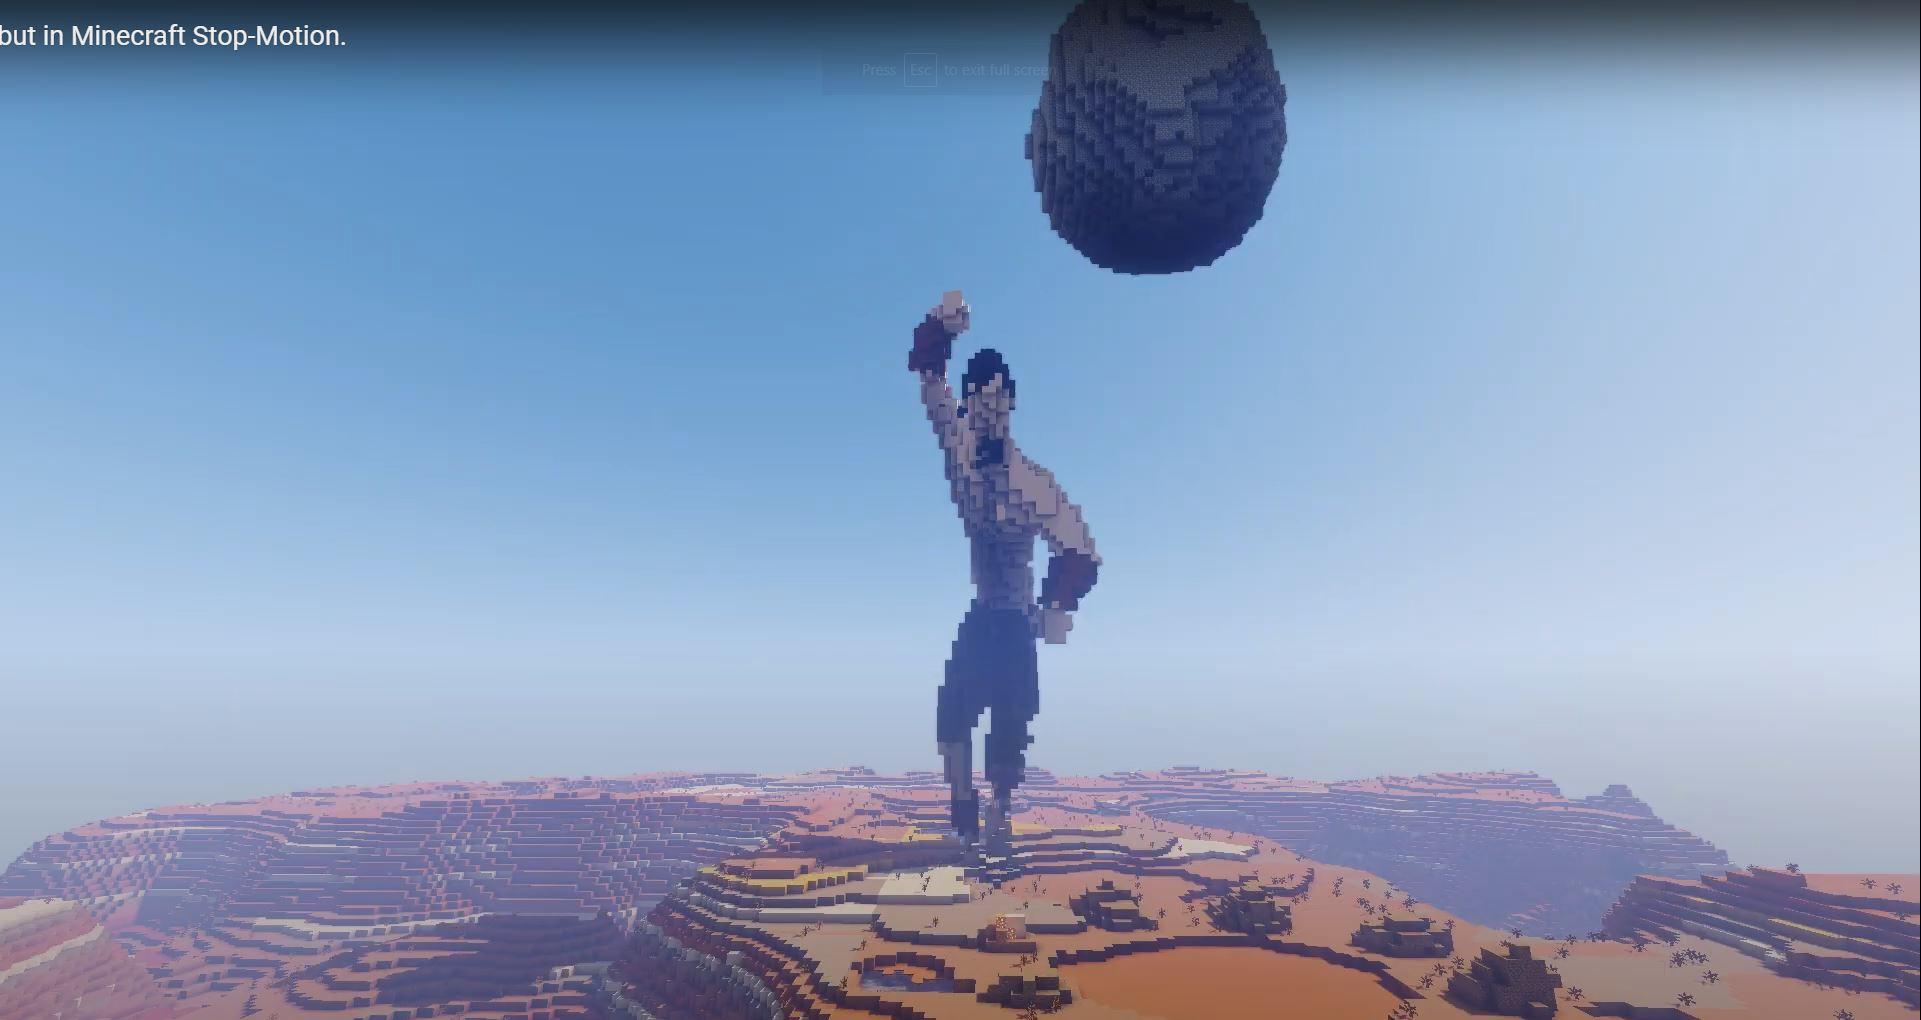 Minecraft YouTuber WeAreSteve Recreated Avatar The Last Airbender's Intro In Minecraft